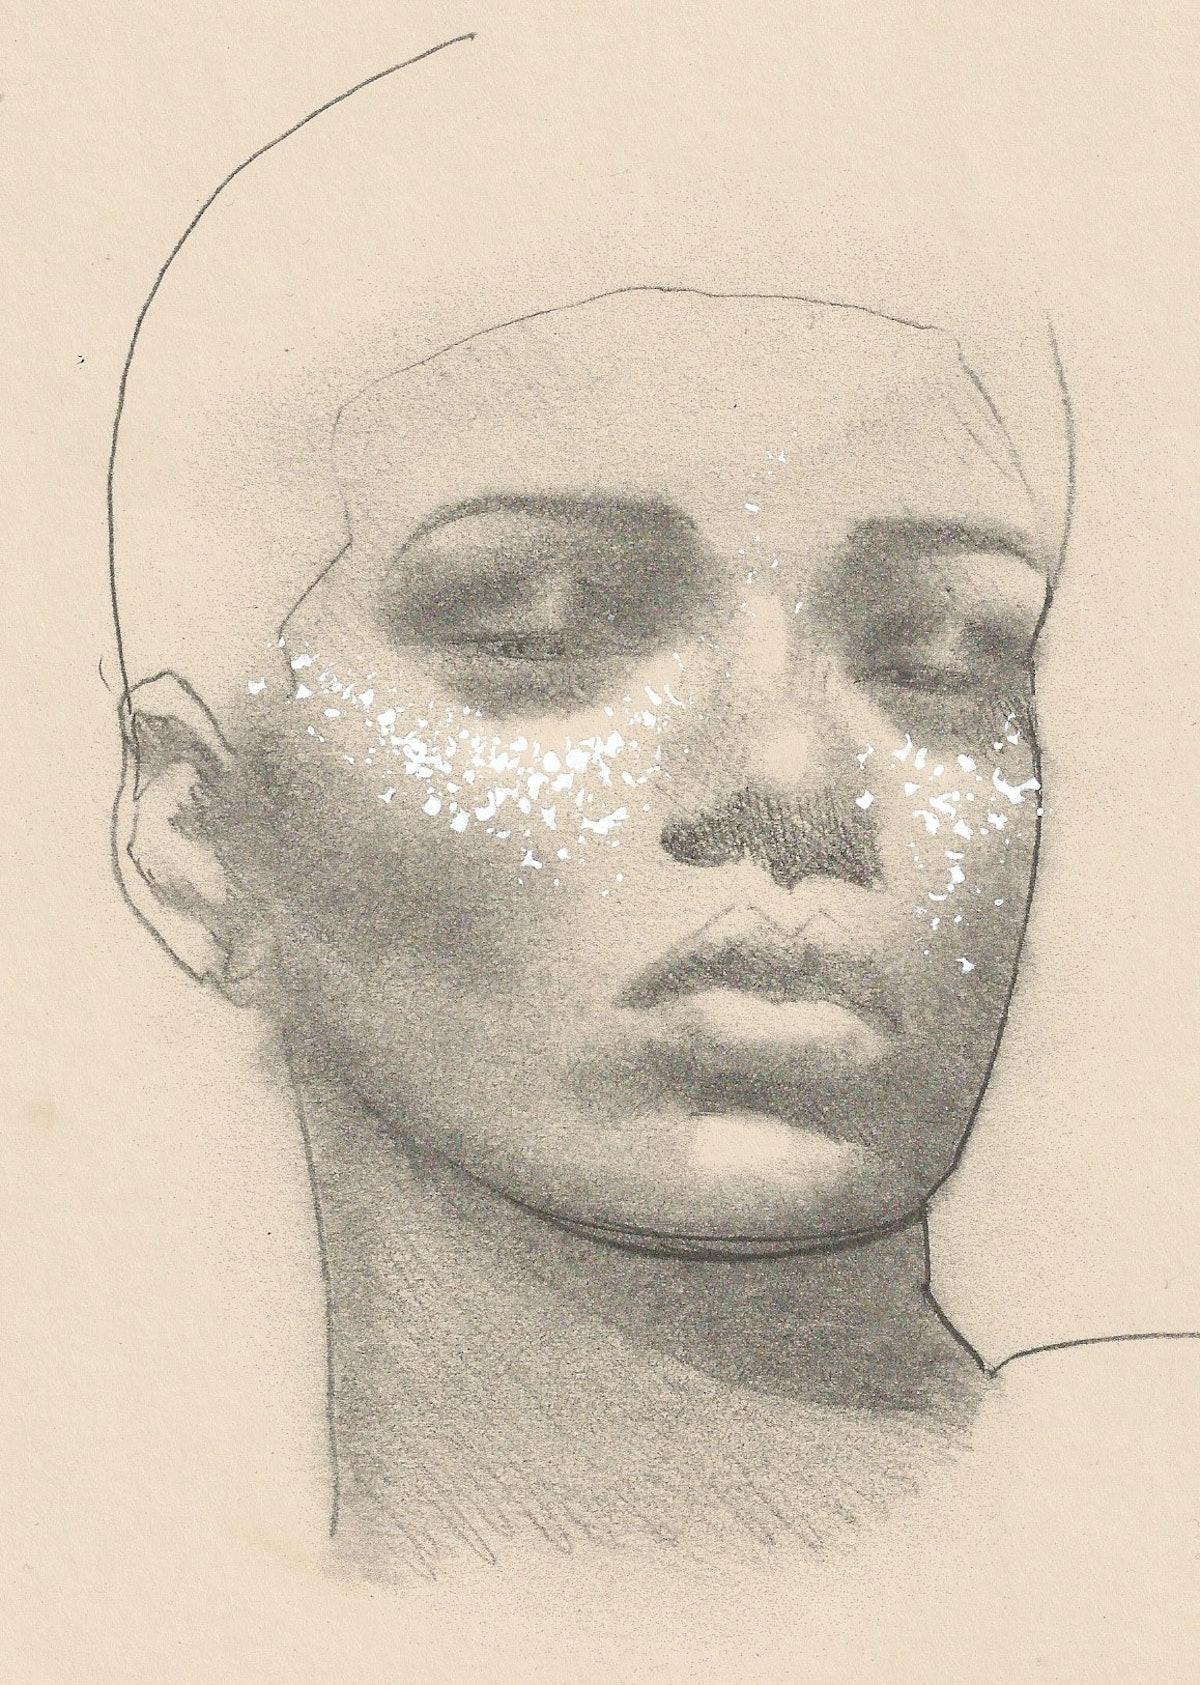 Kabuki's sketch of Rihanna